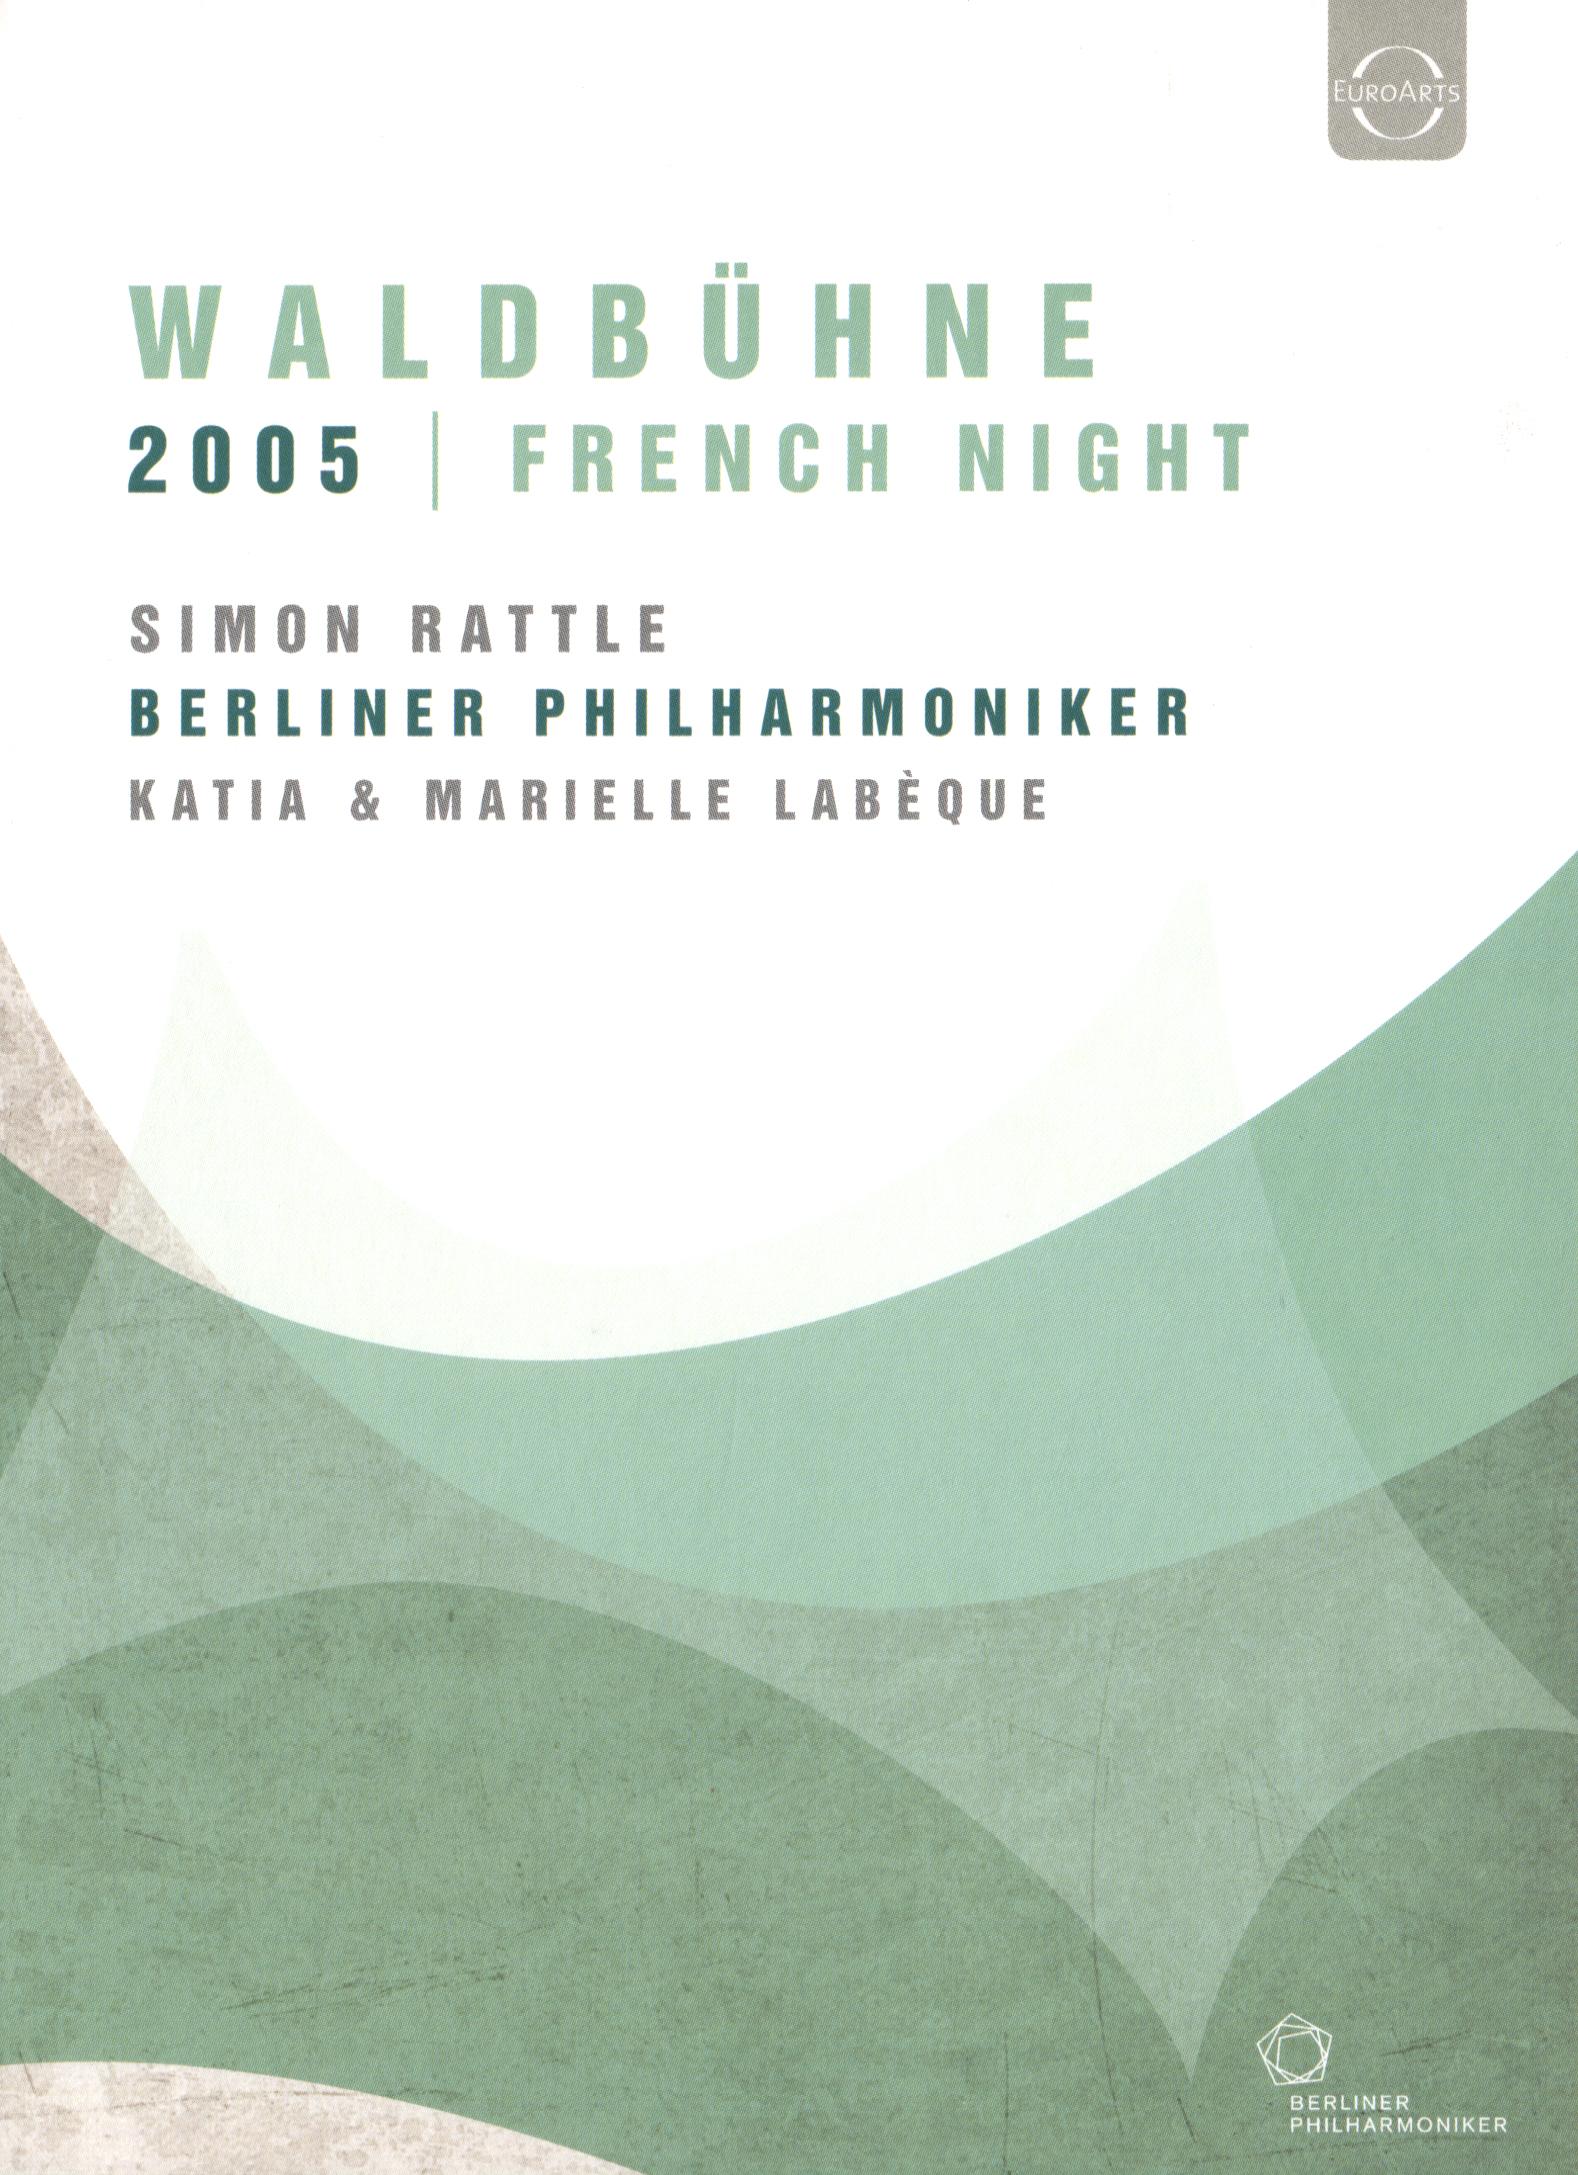 Waldbühne 2005: French Night